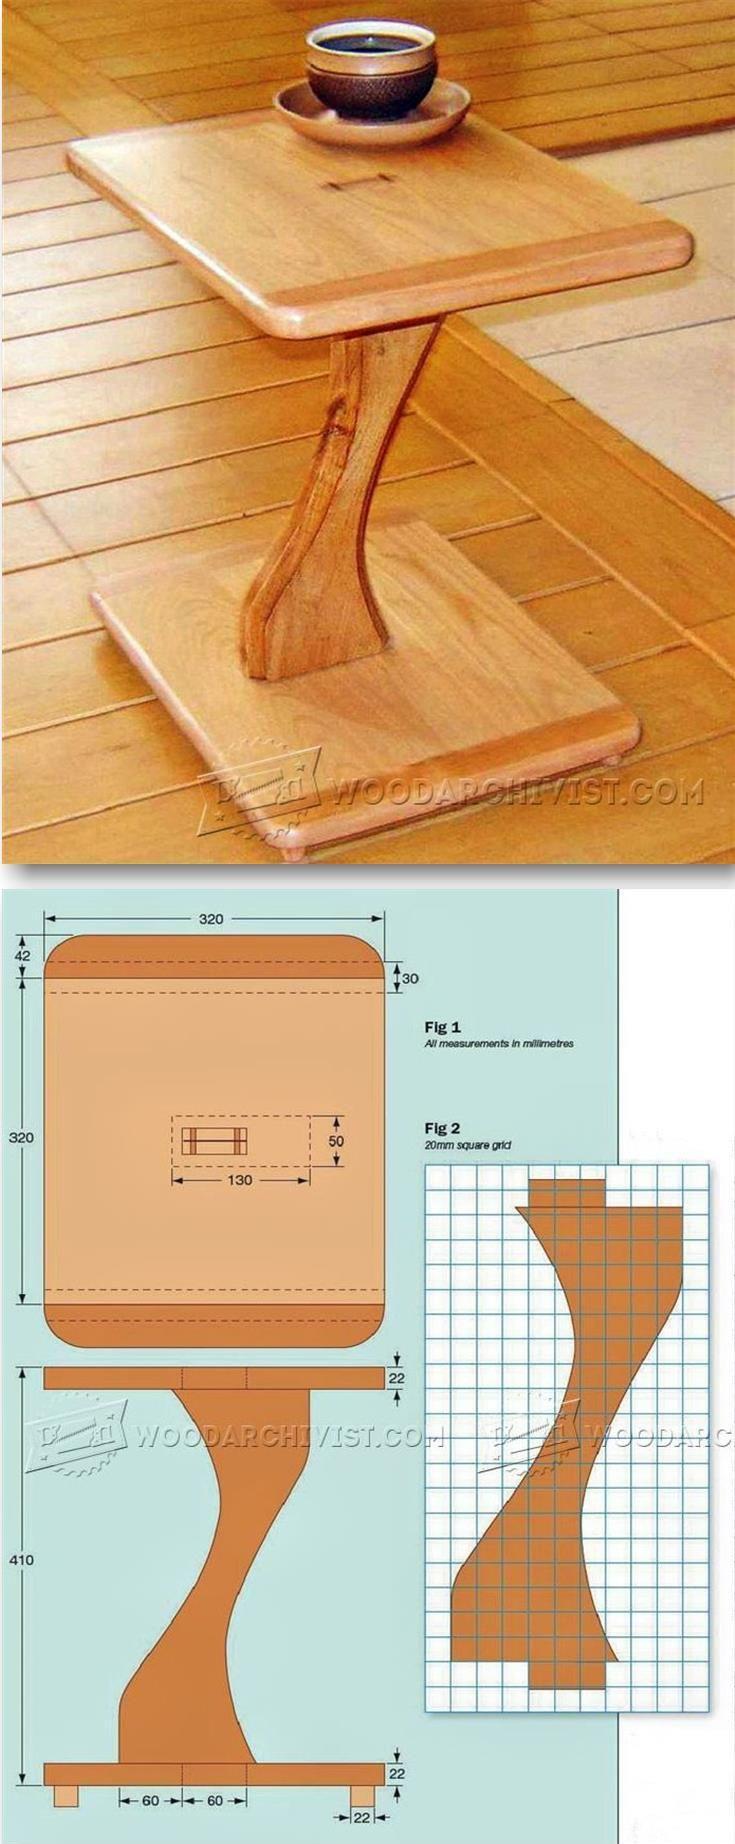 Pedestal Table Plans - Furniture Plans and Projects | WoodArchivist.com